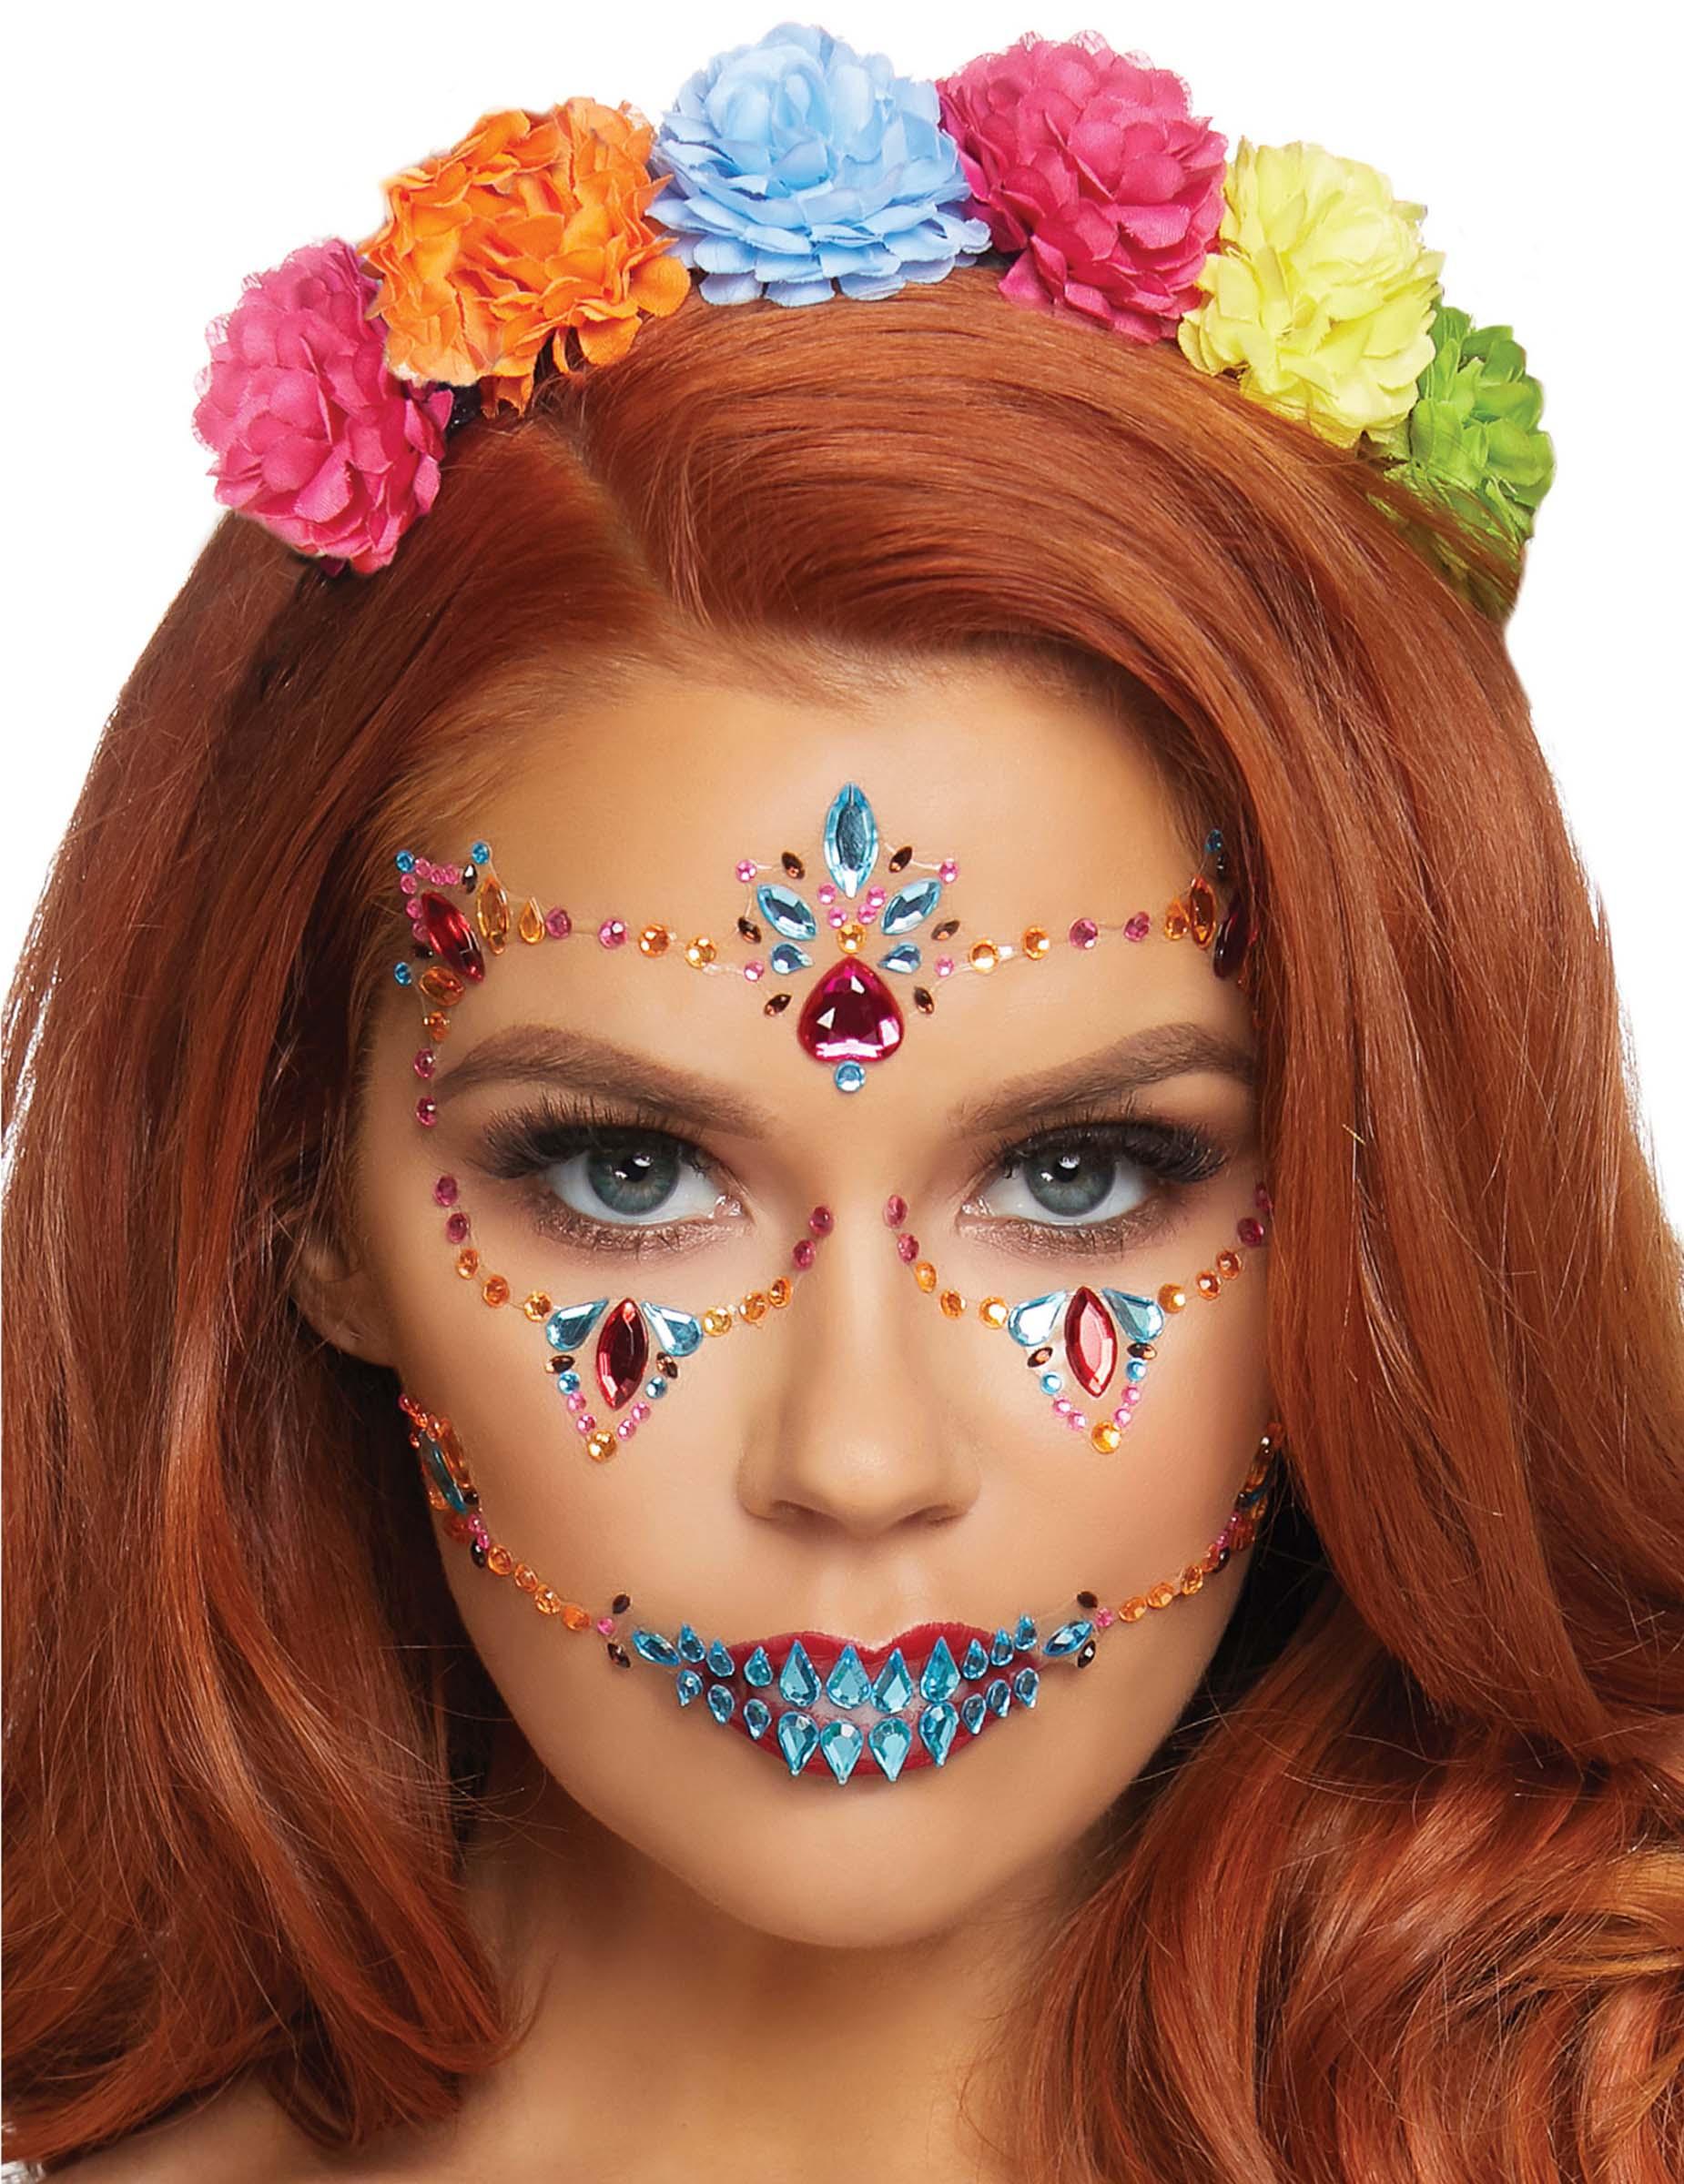 Dia de los muertos-Glitzersteine Make-up idee bunt 293438